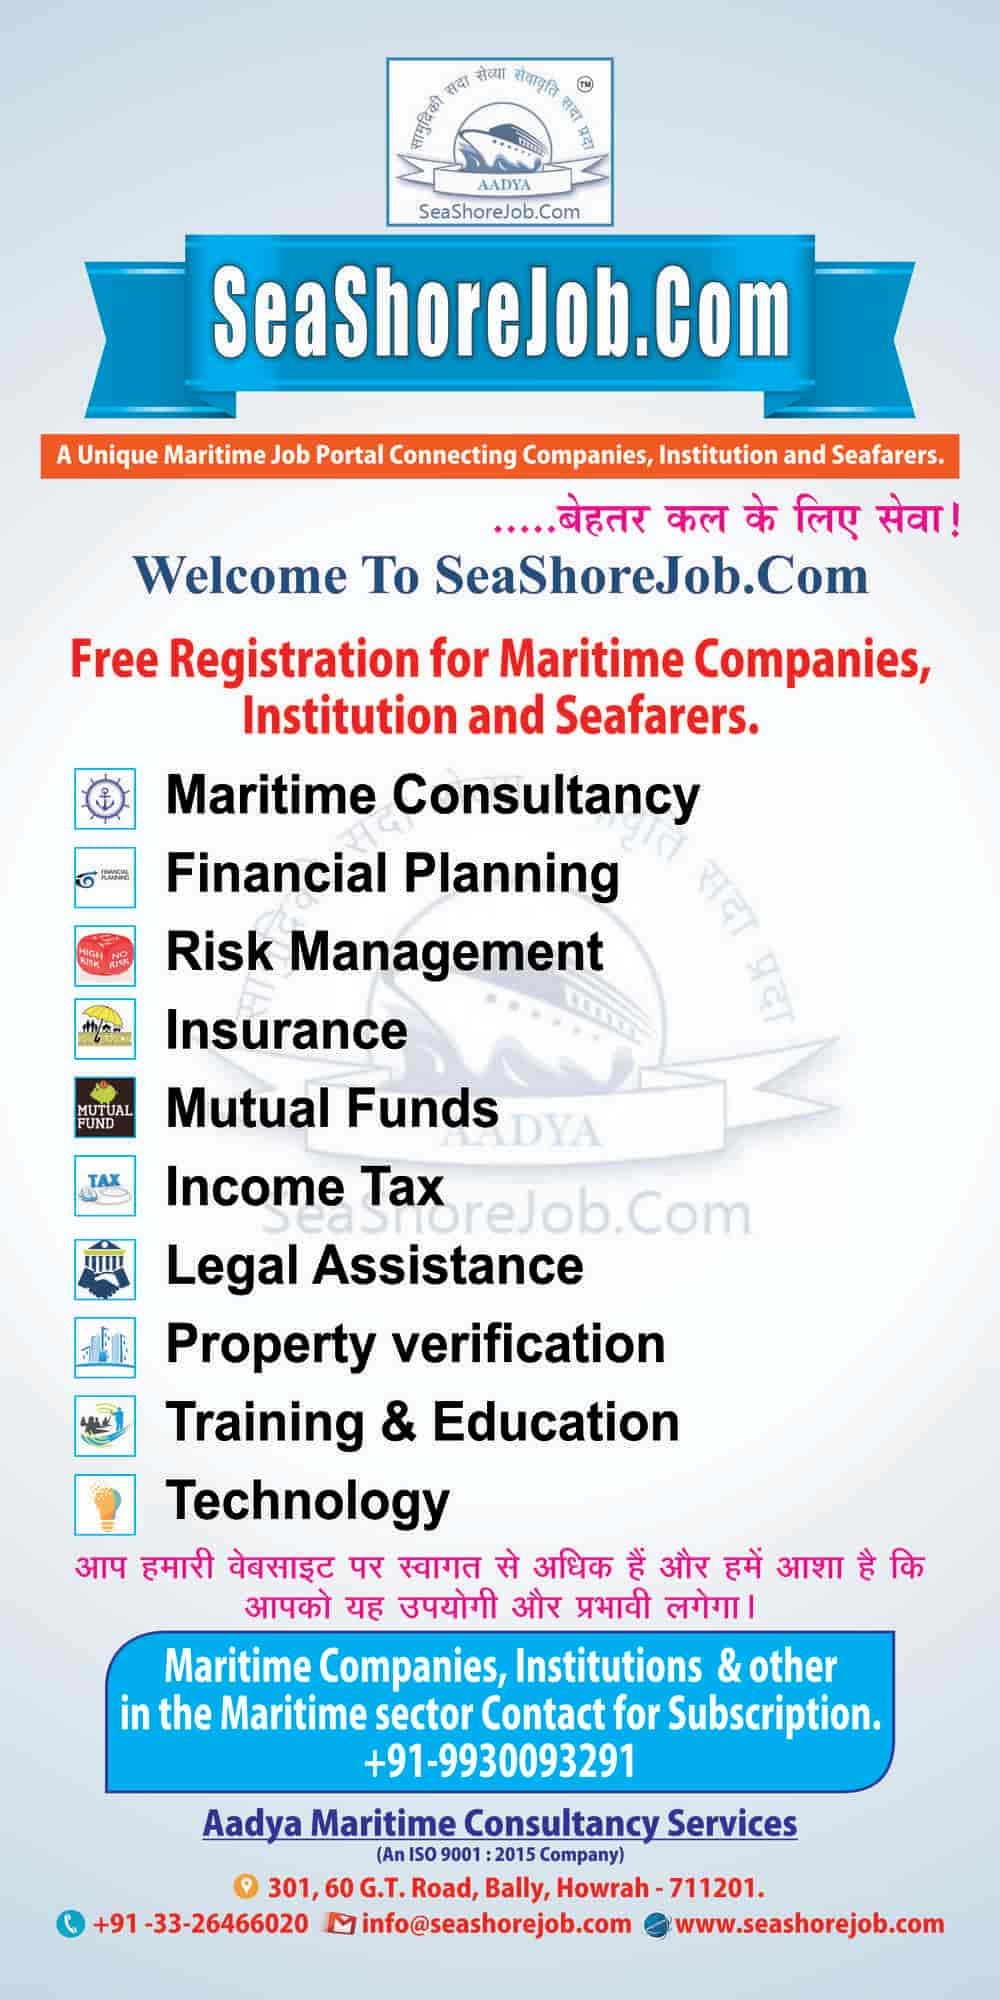 Seashorejob com, Bally - Marine Institutes in Kolkata - Justdial